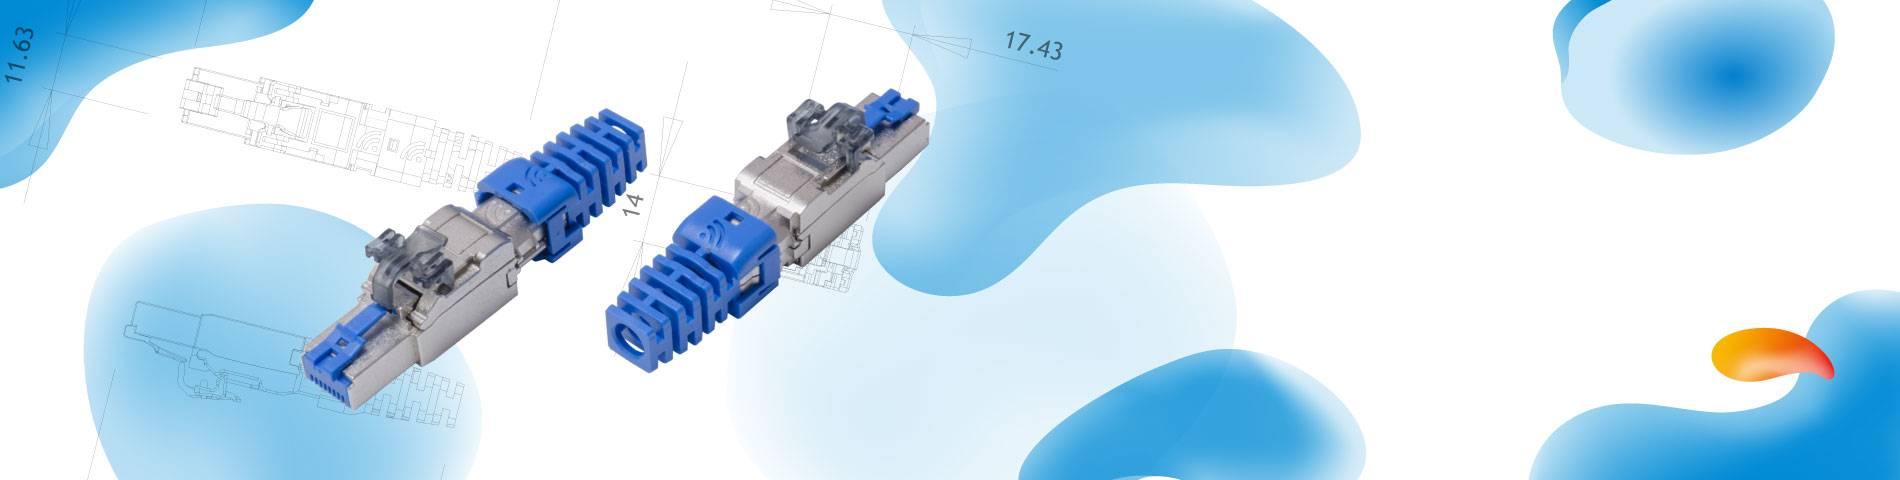 HCI Field Termination Plug ISO/IEC Cat6A PoE+